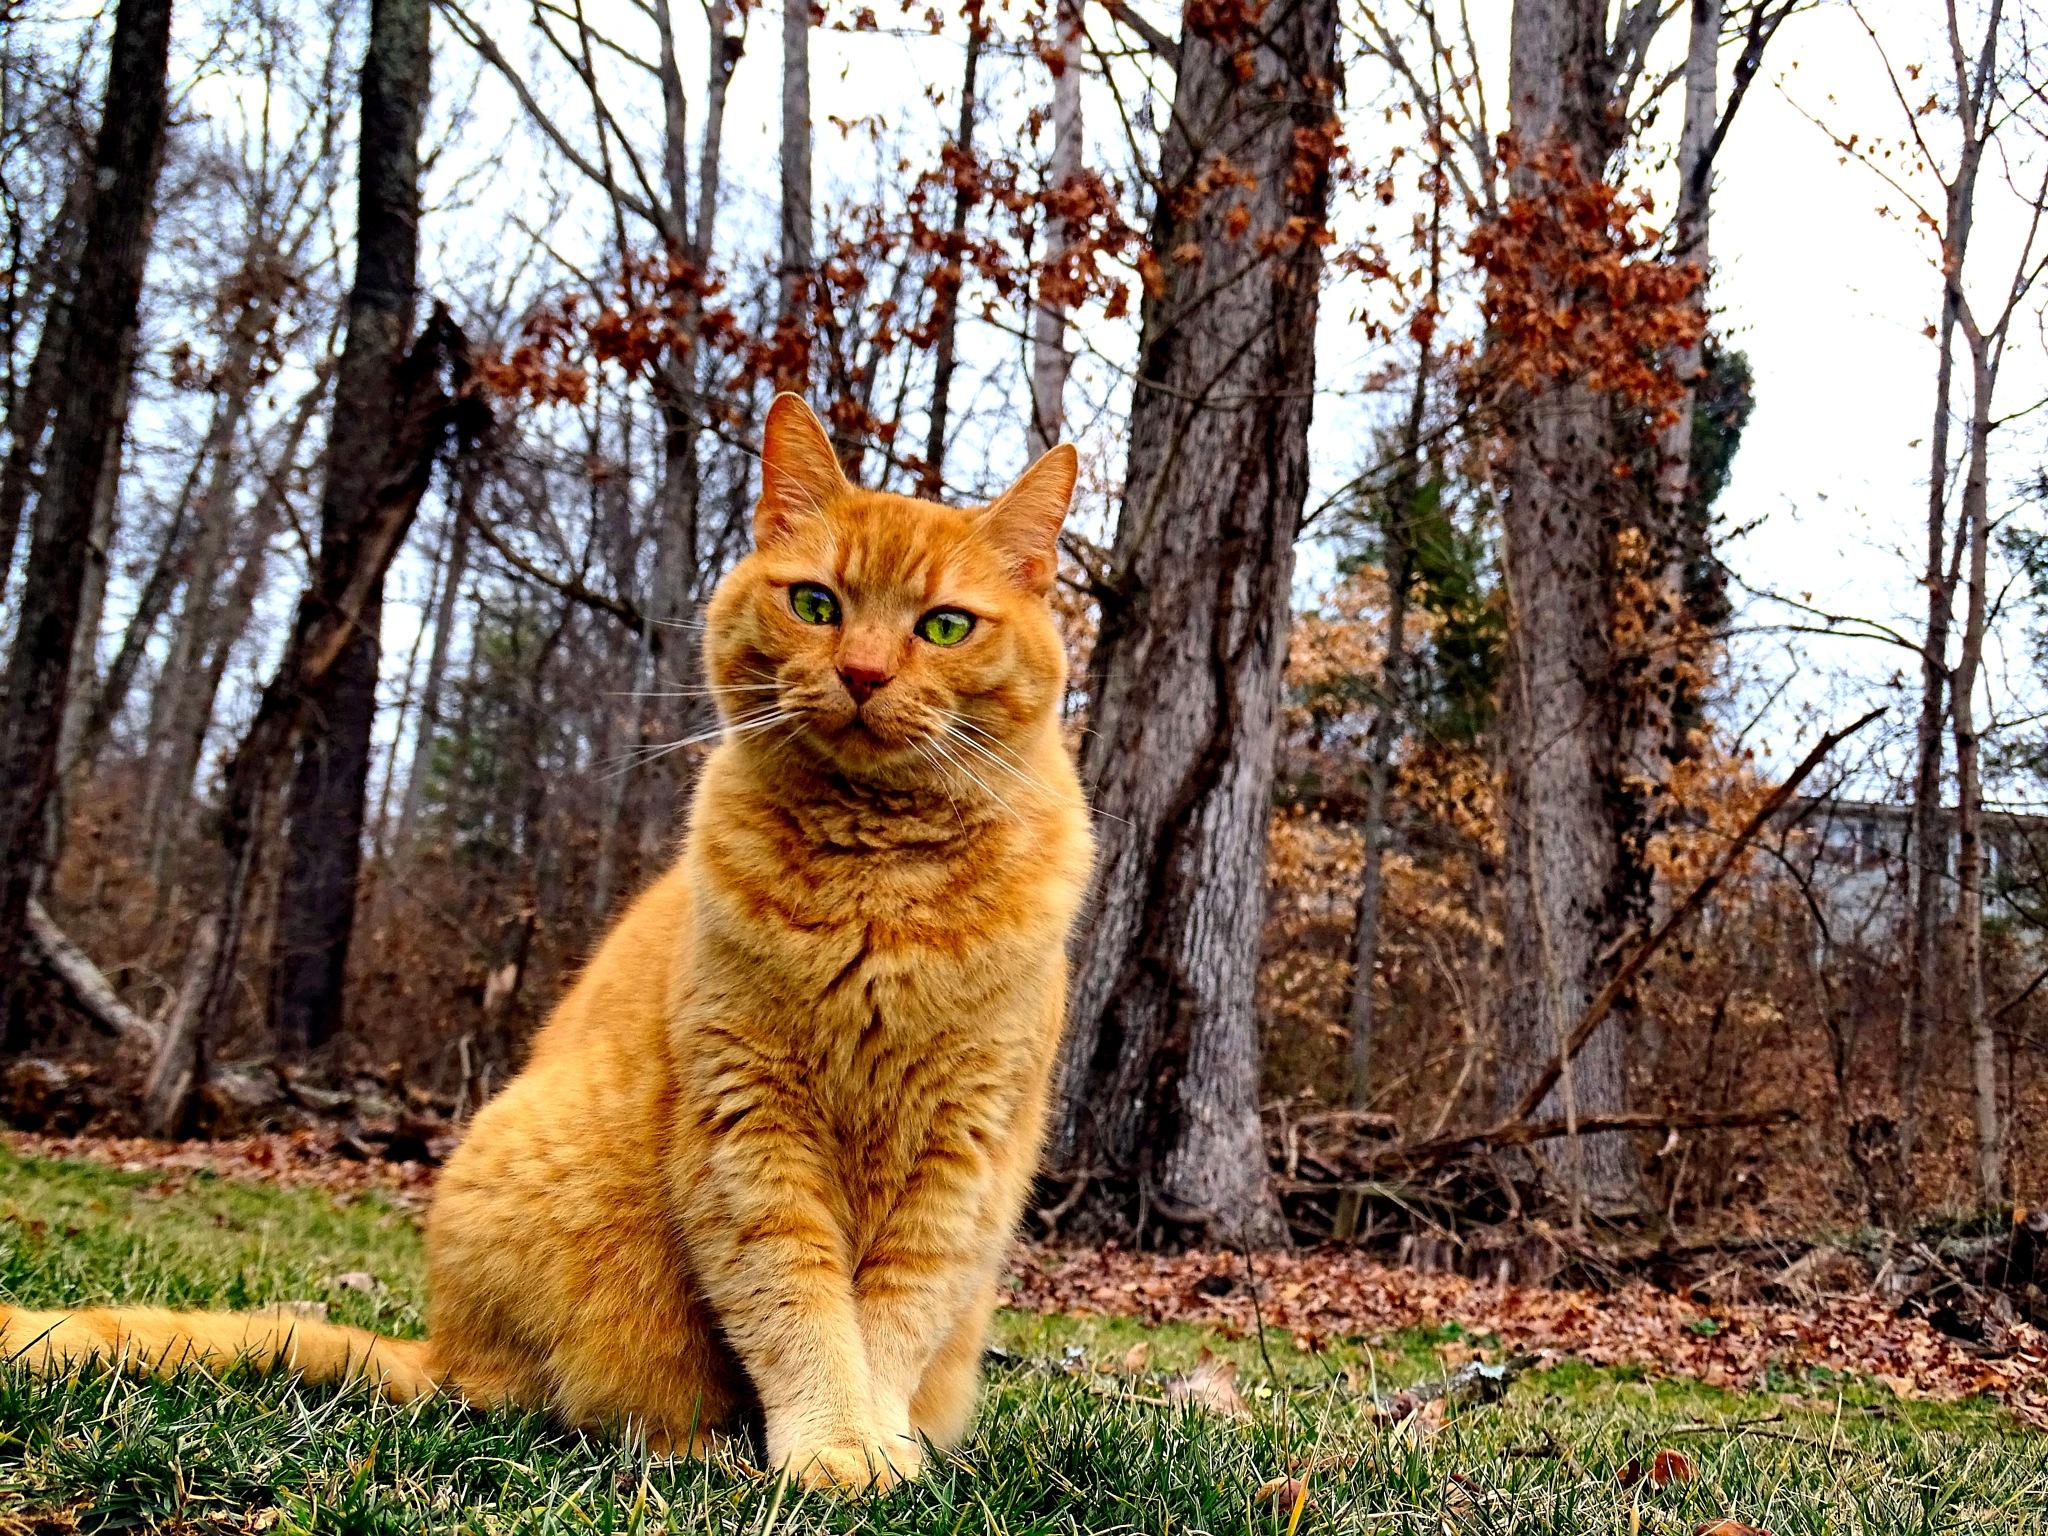 Cider, my Orange Tabby Cat by Patty Stockton